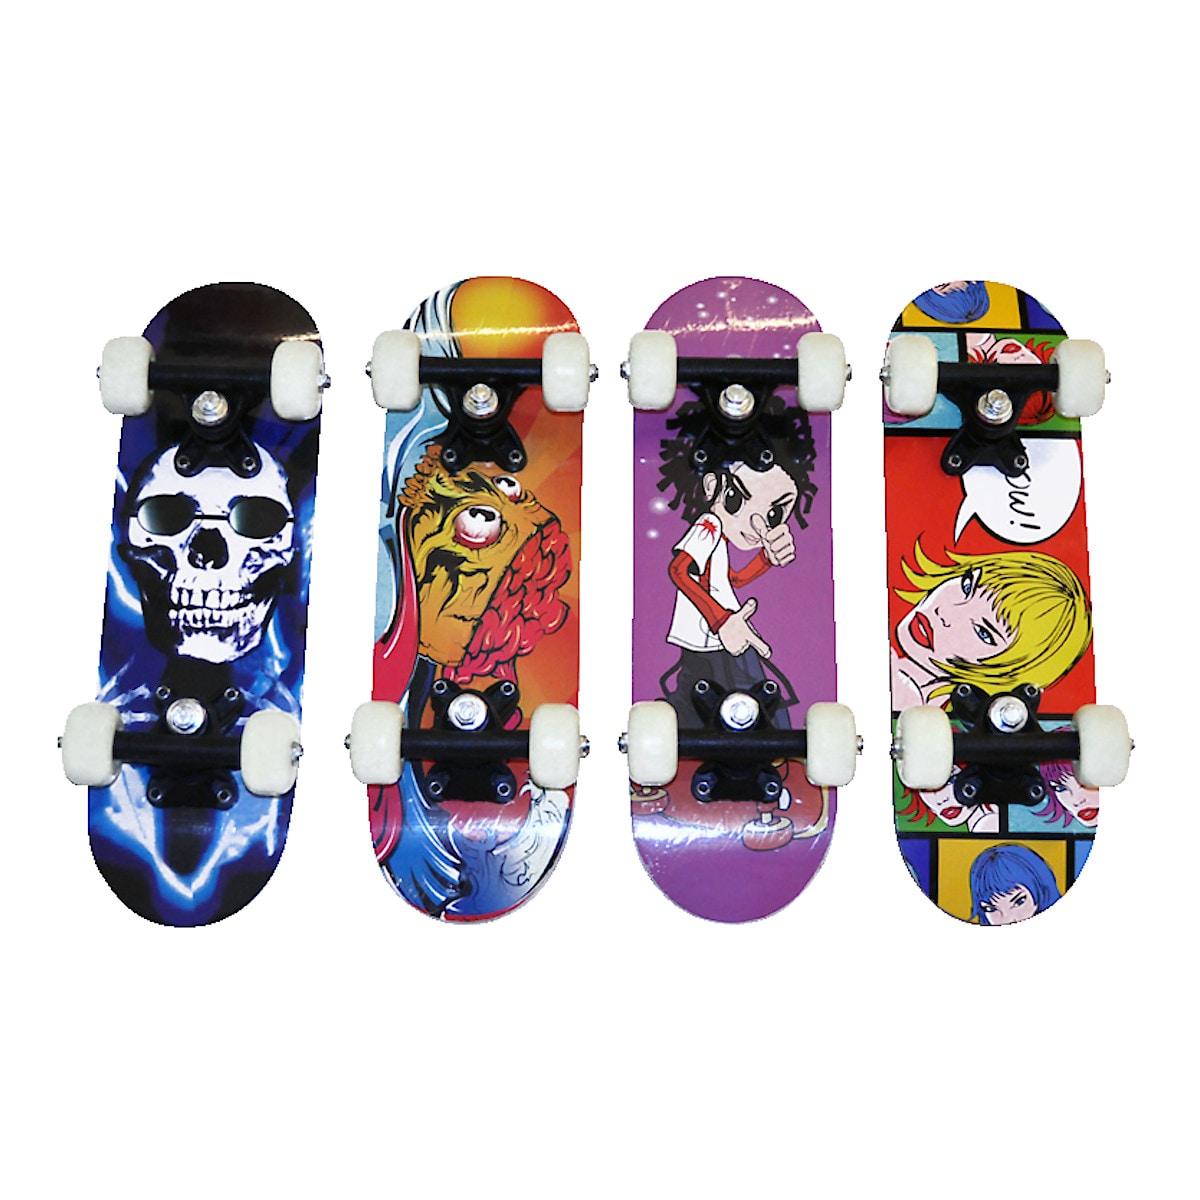 Miniskateboard